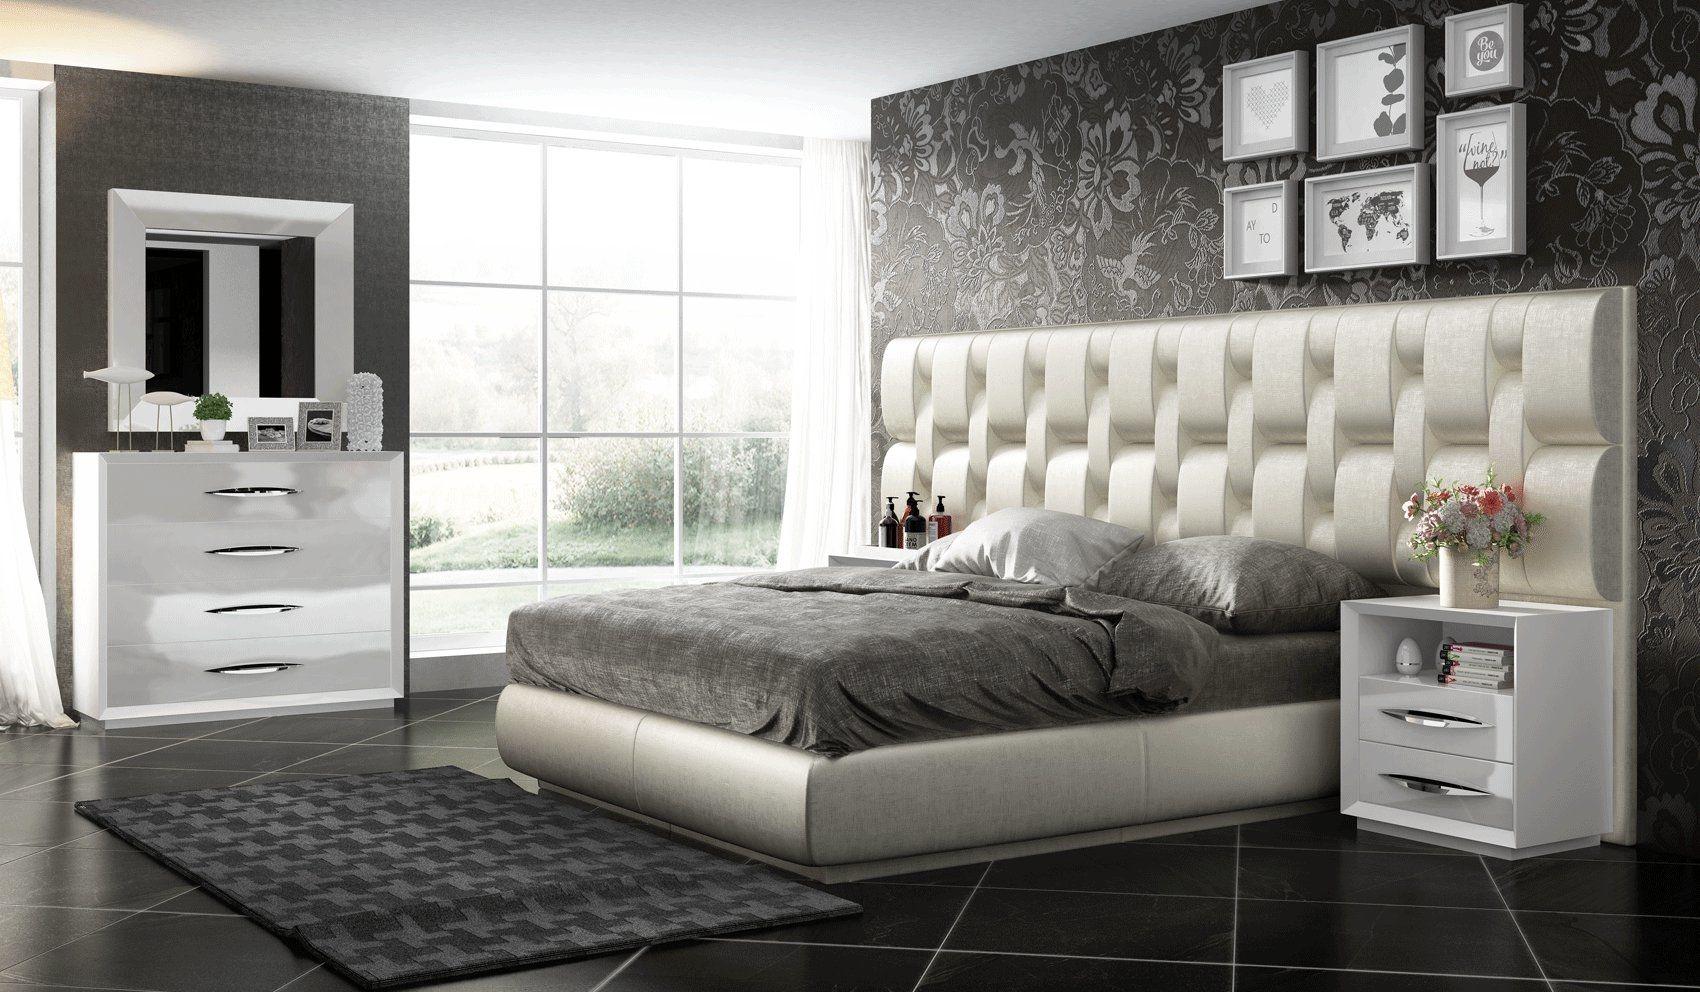 Emporio Queen Size Bed emporio Franco Spain Modern Beds in